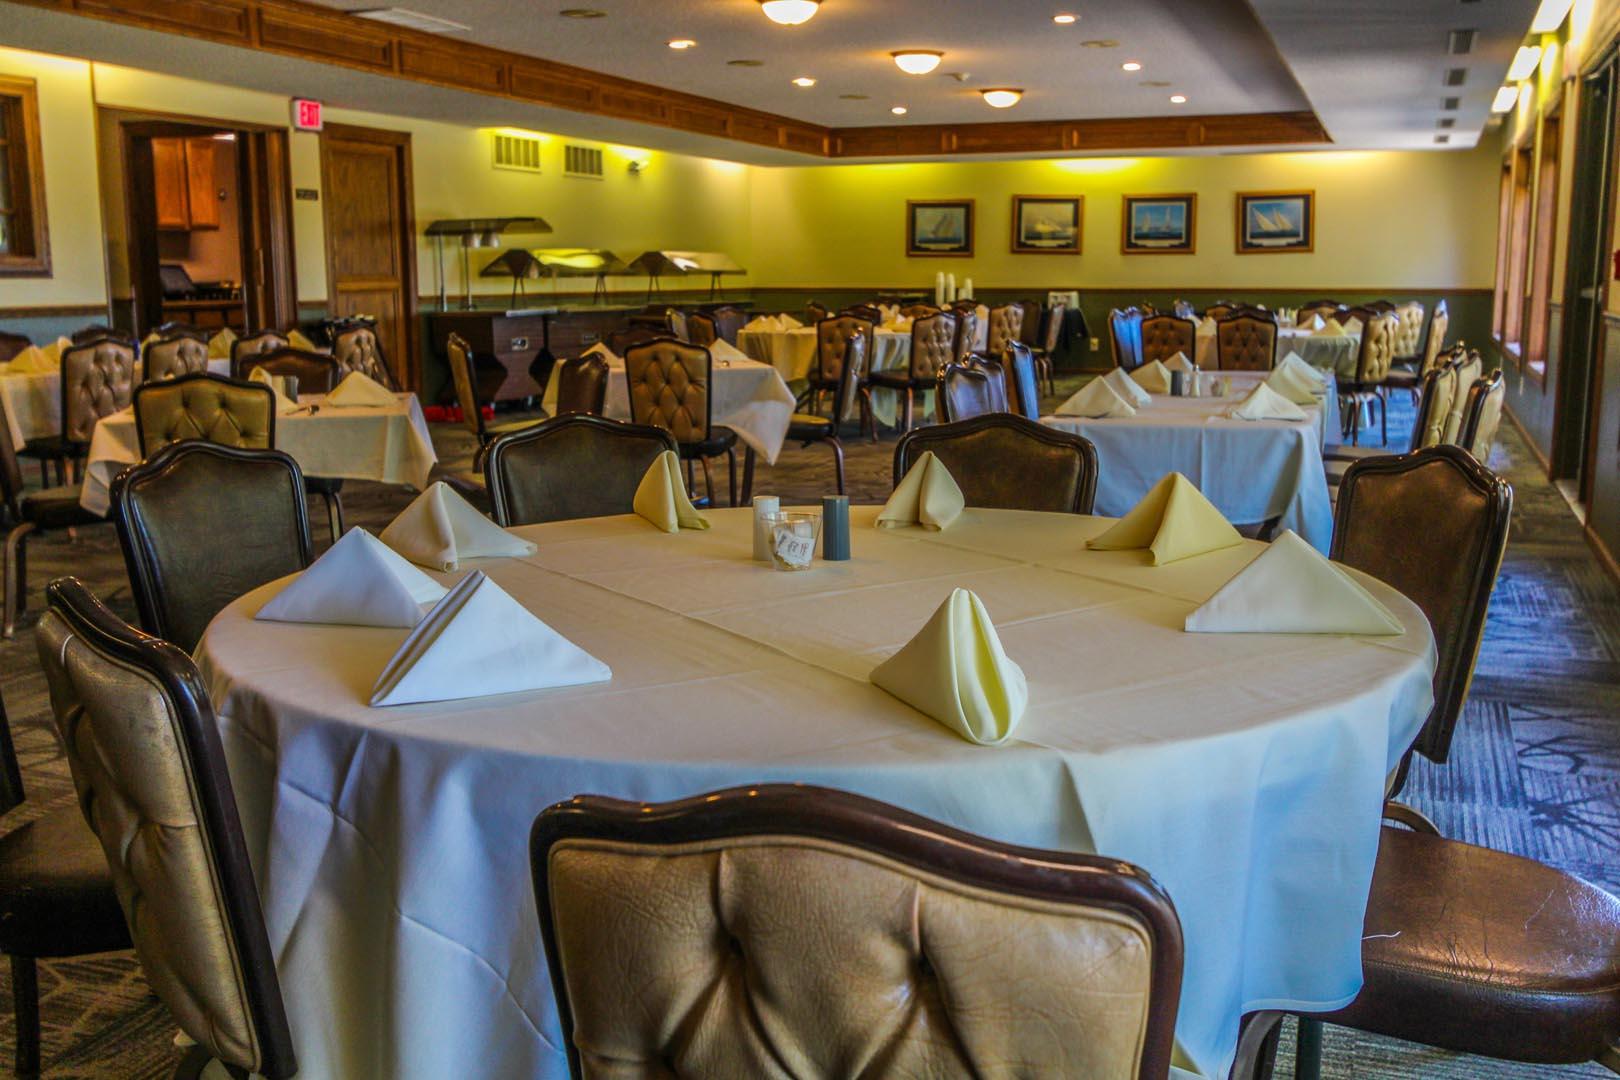 Clover Ridge Resort Restaurant